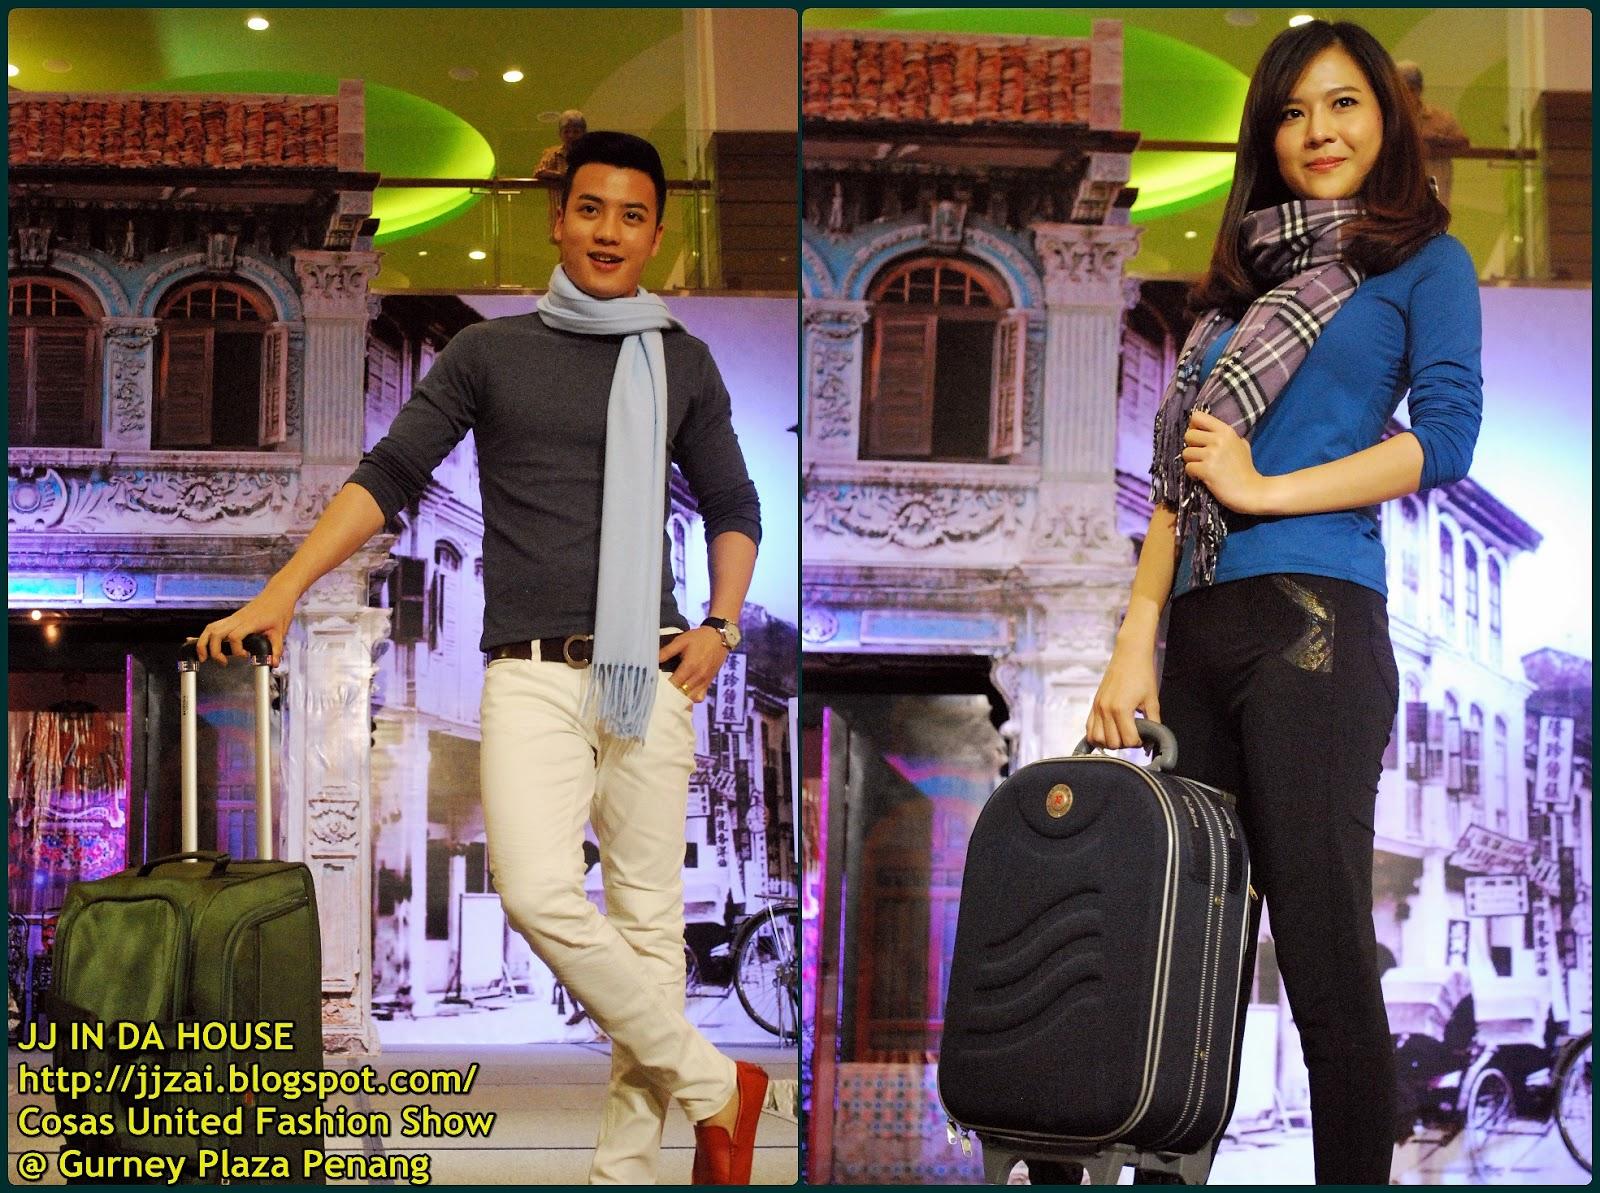 Jj In Da House Cosas United Fashion Show Gurney Plaza Penang